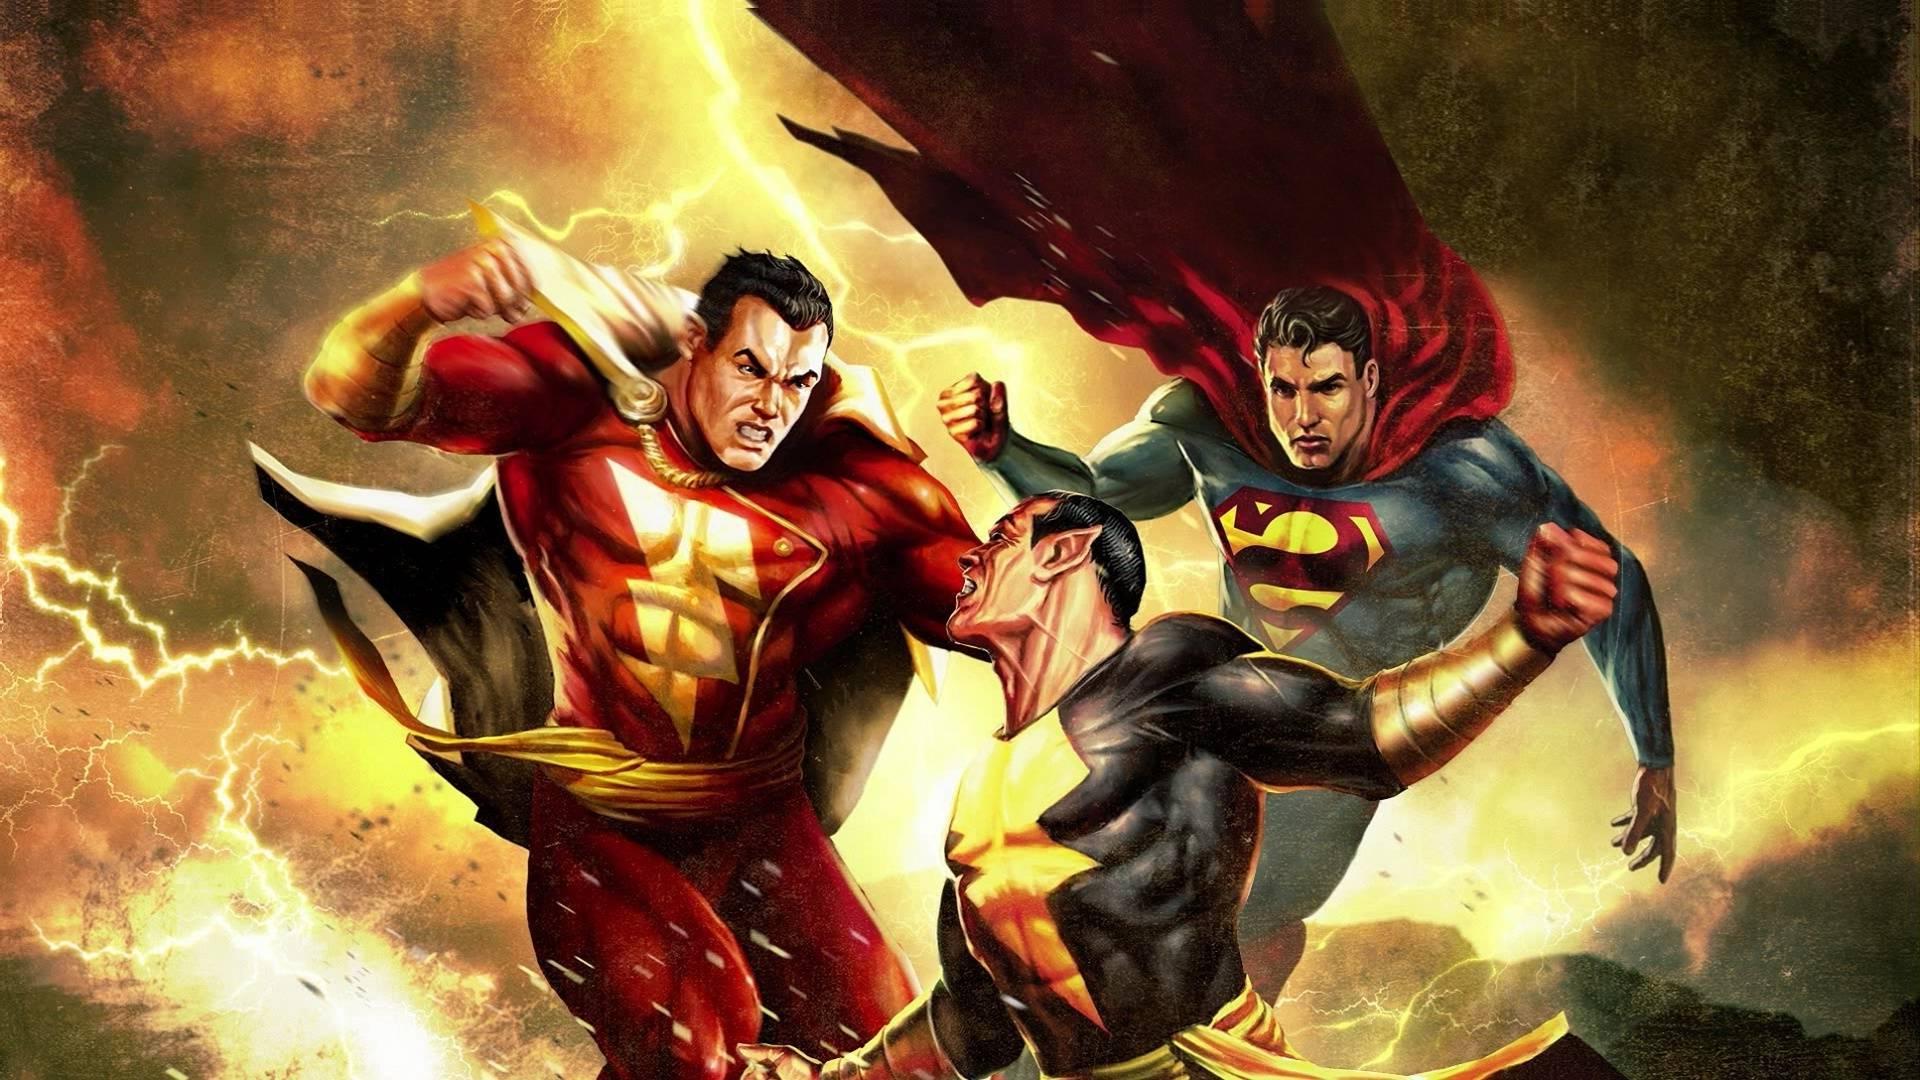 Amazing Superman Shazam!: The Return Of Black Adam Pictures & Backgrounds